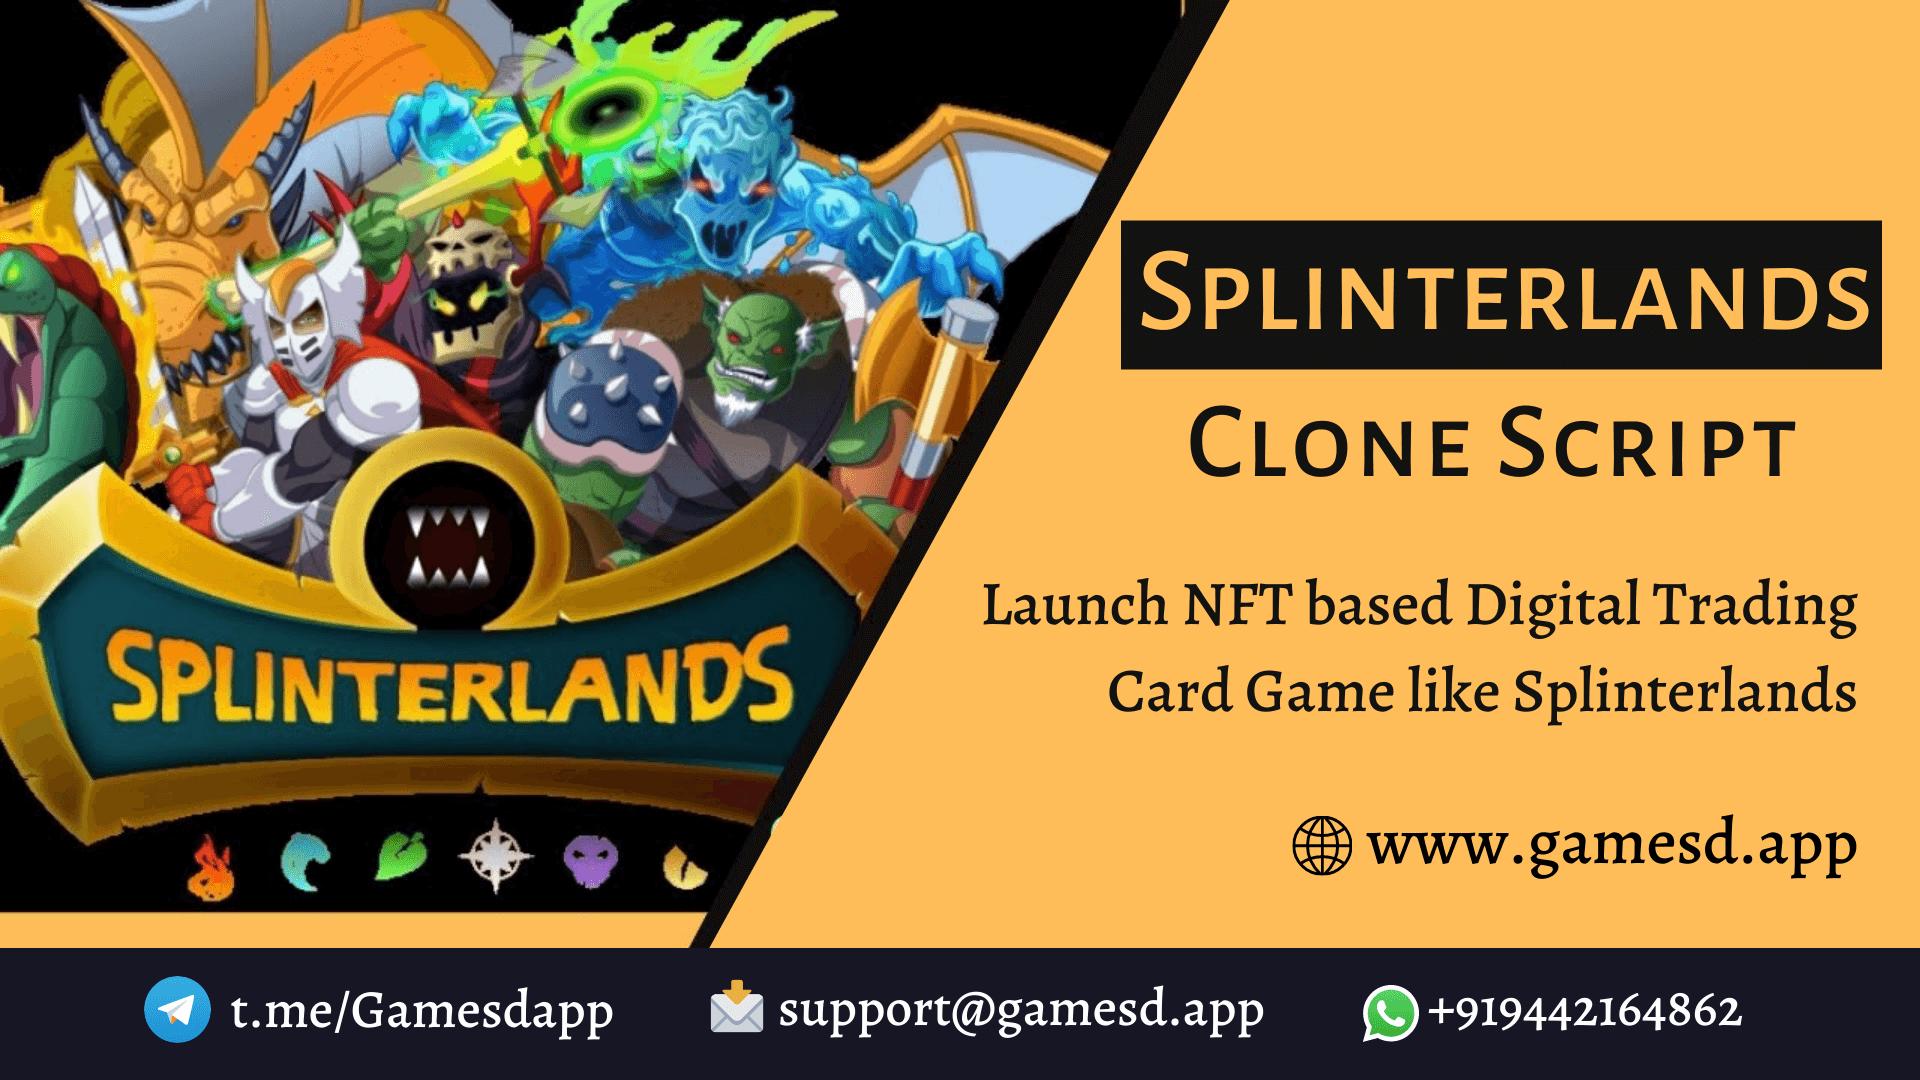 Splinterlands Clone Script To Launch NFT based Digital Trading Card Game on Popular Blockchain Network